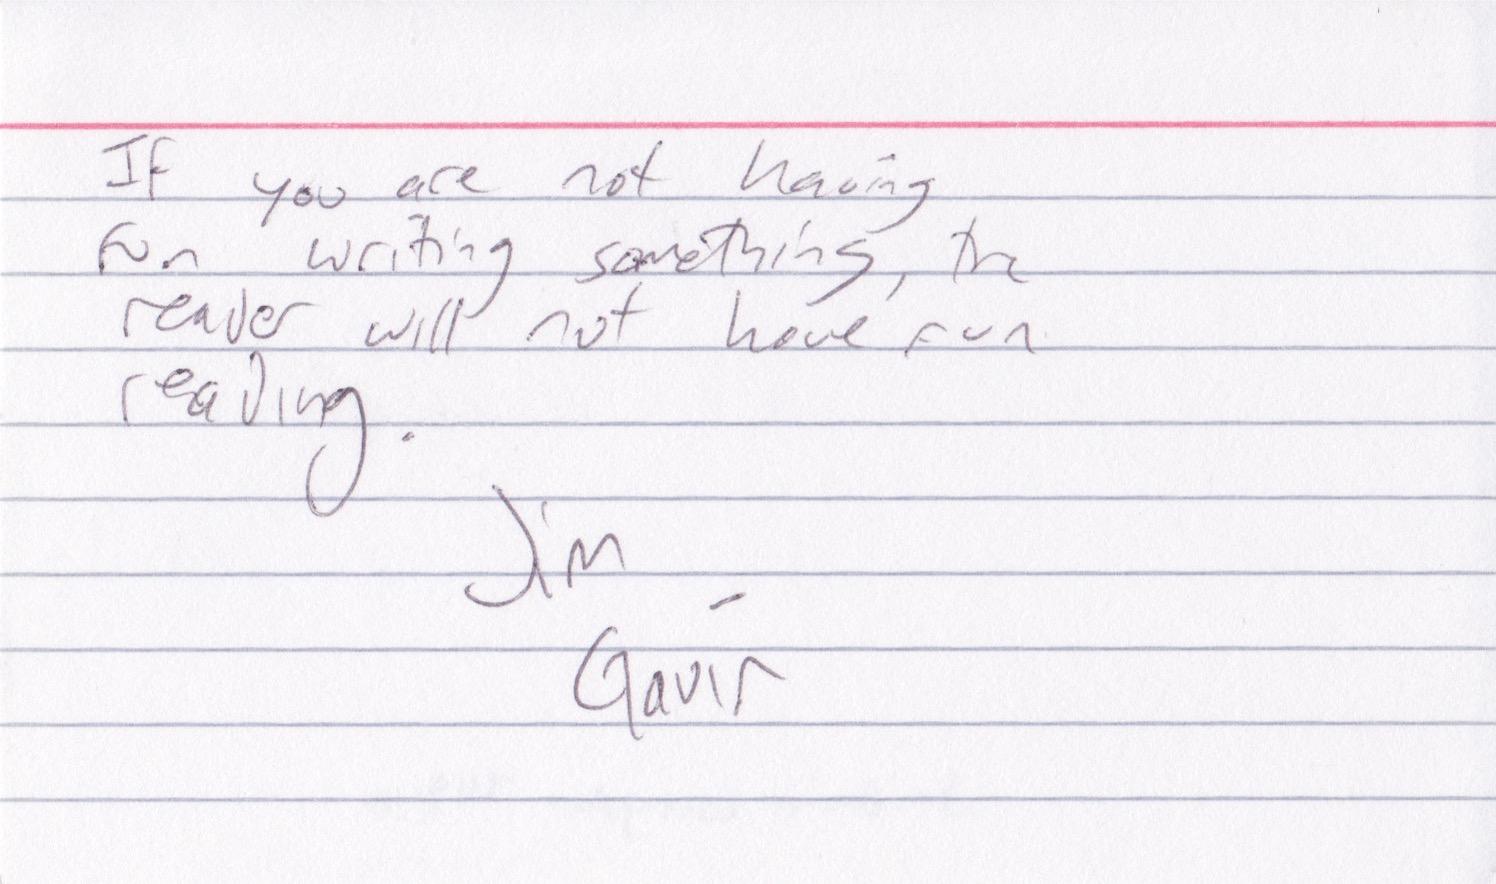 Jim Gavin